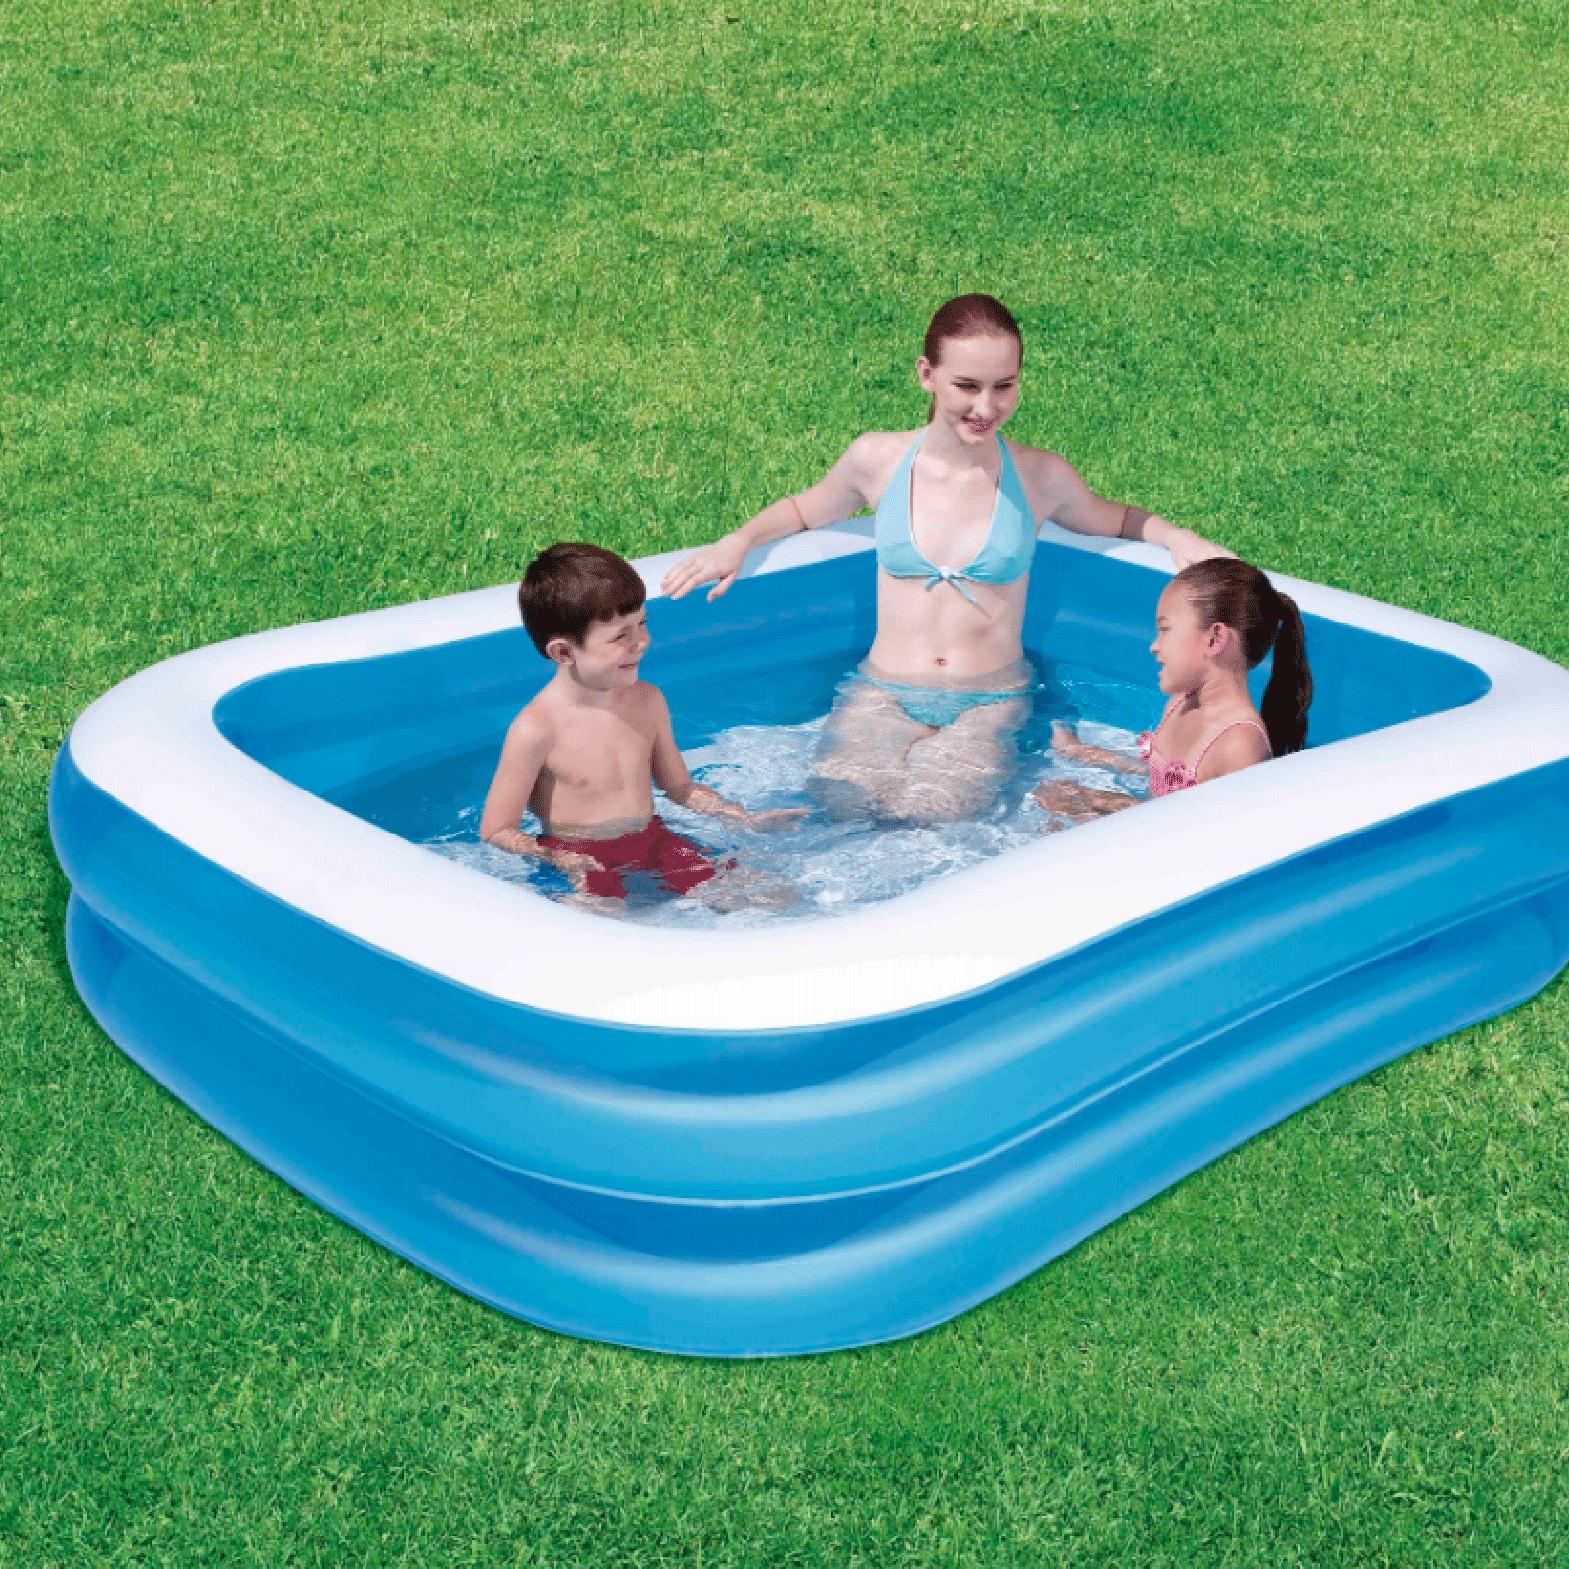 Opblaas zwembad 211 x 132 cm